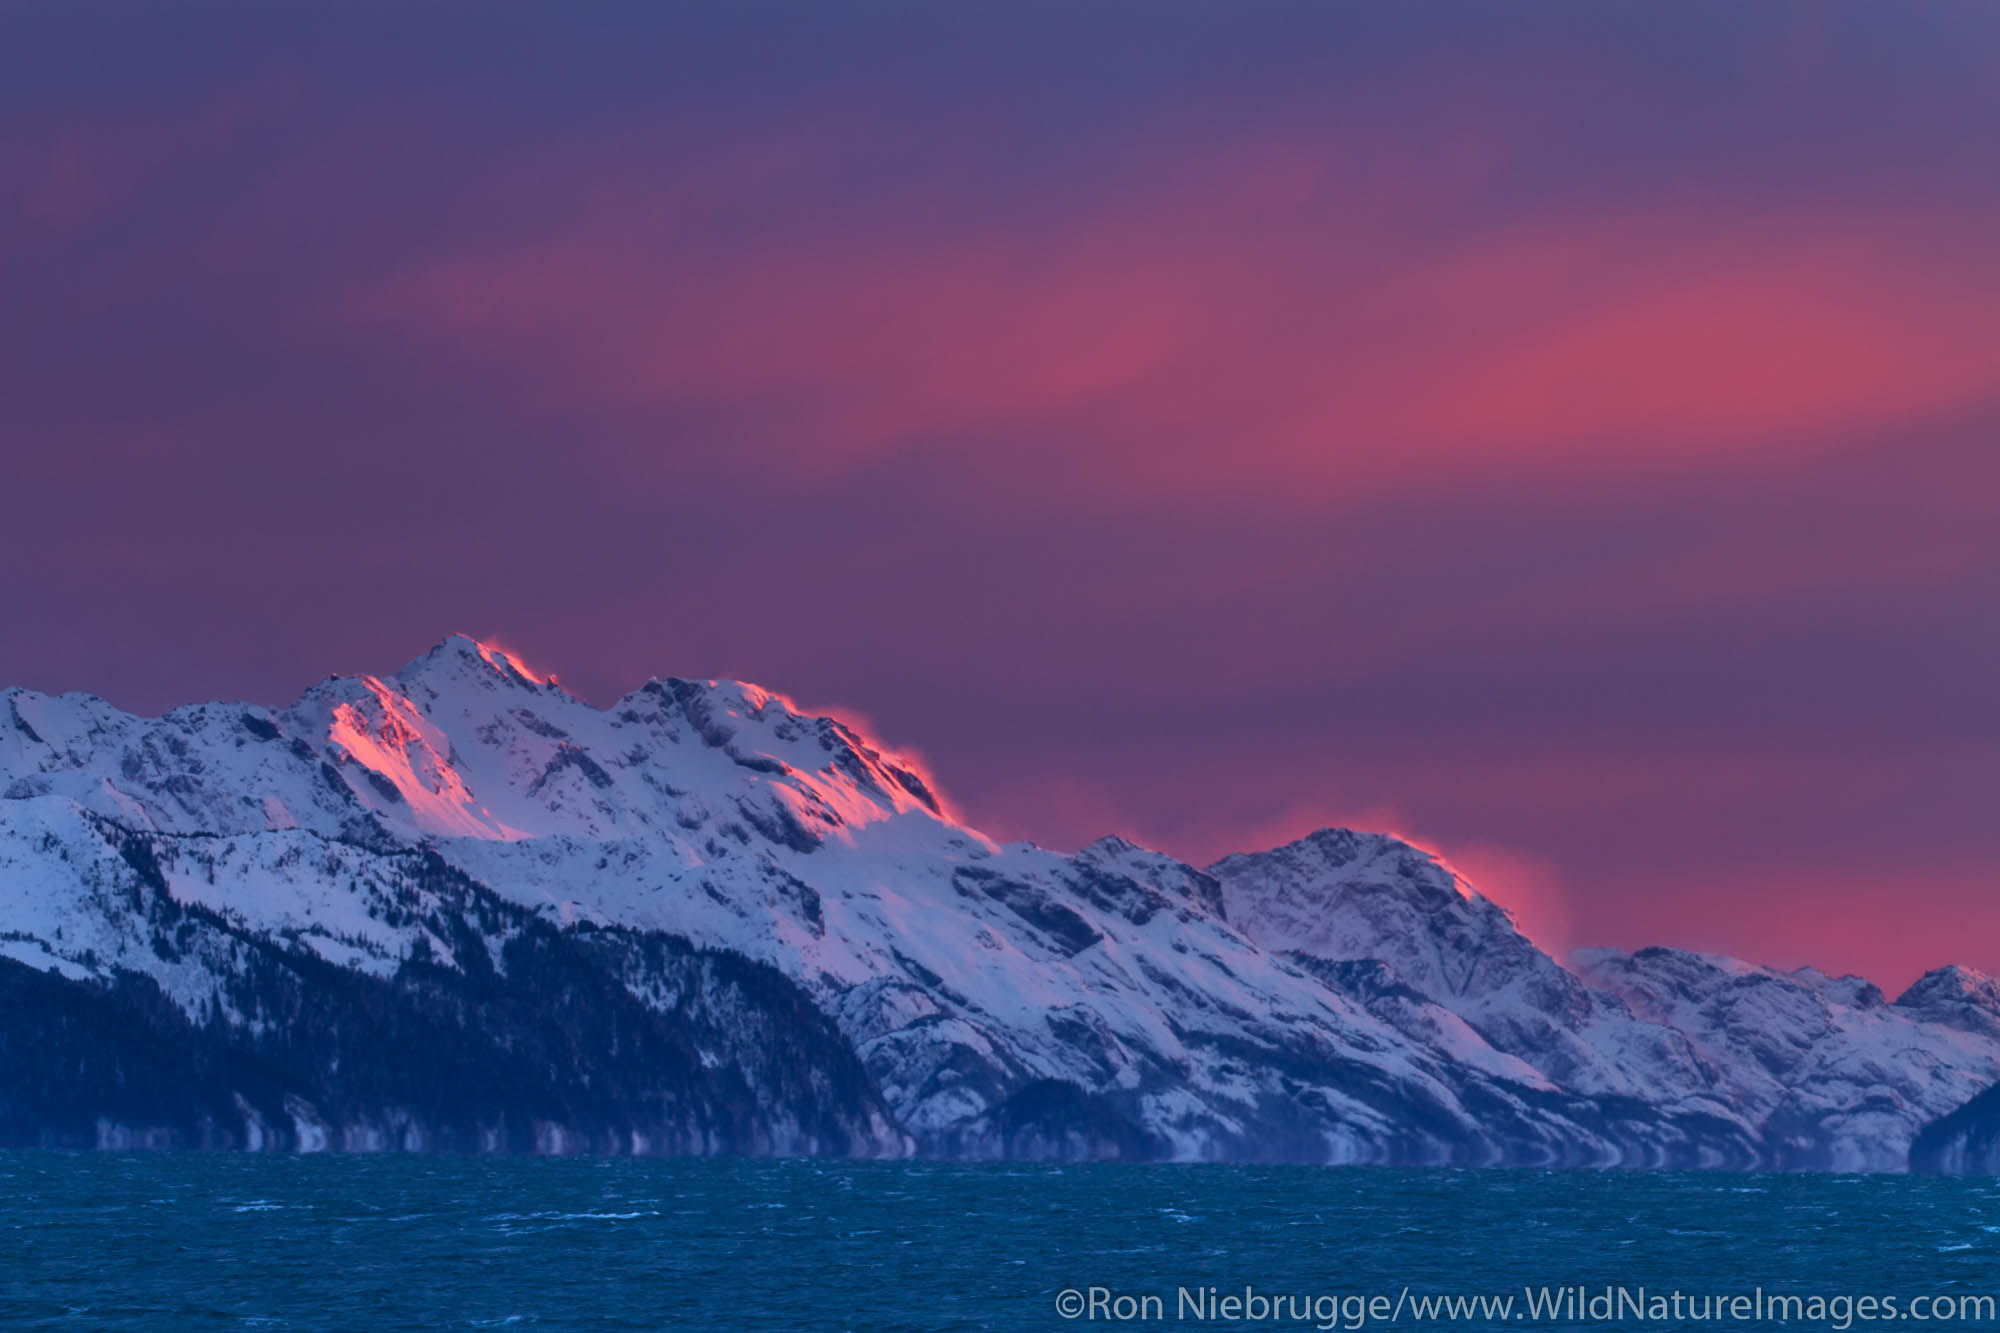 Winter sunset on Resurrection Bay, Seward, Alaska.